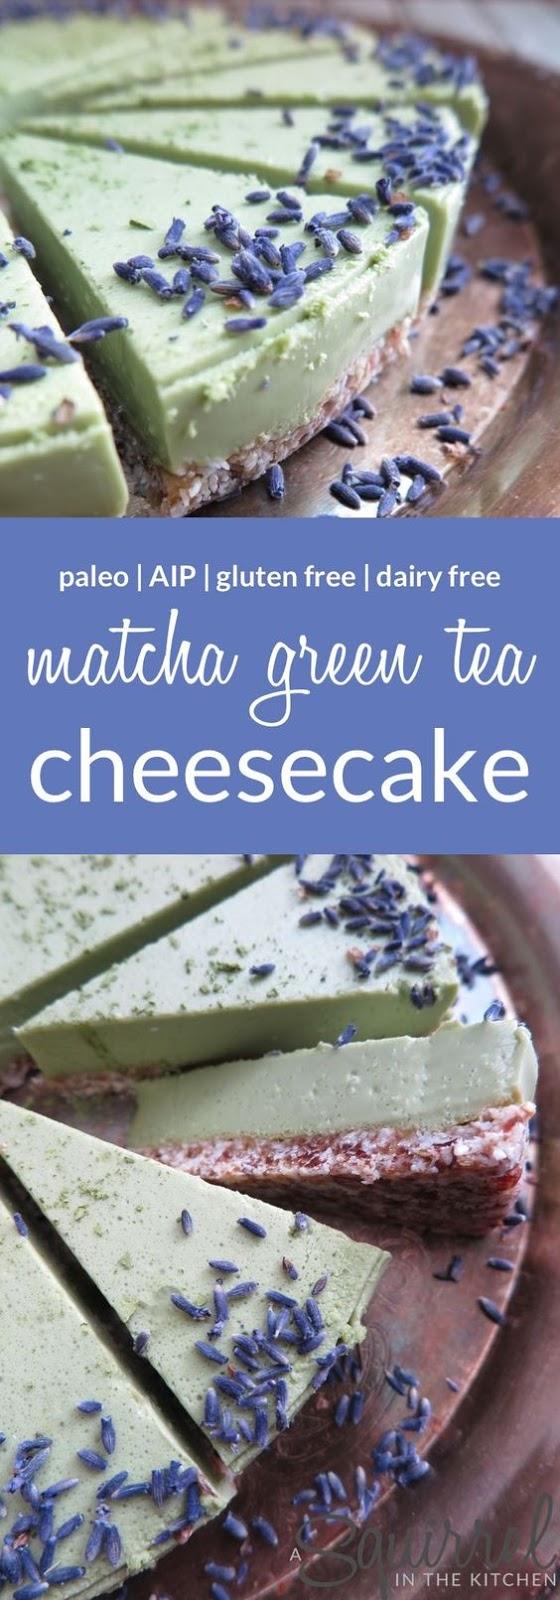 NO-BAKE MATCHA GREEN TEA CHEESECAKE [DAIRY-FREE-GLUTEN-FREE-PALEO-AIP]